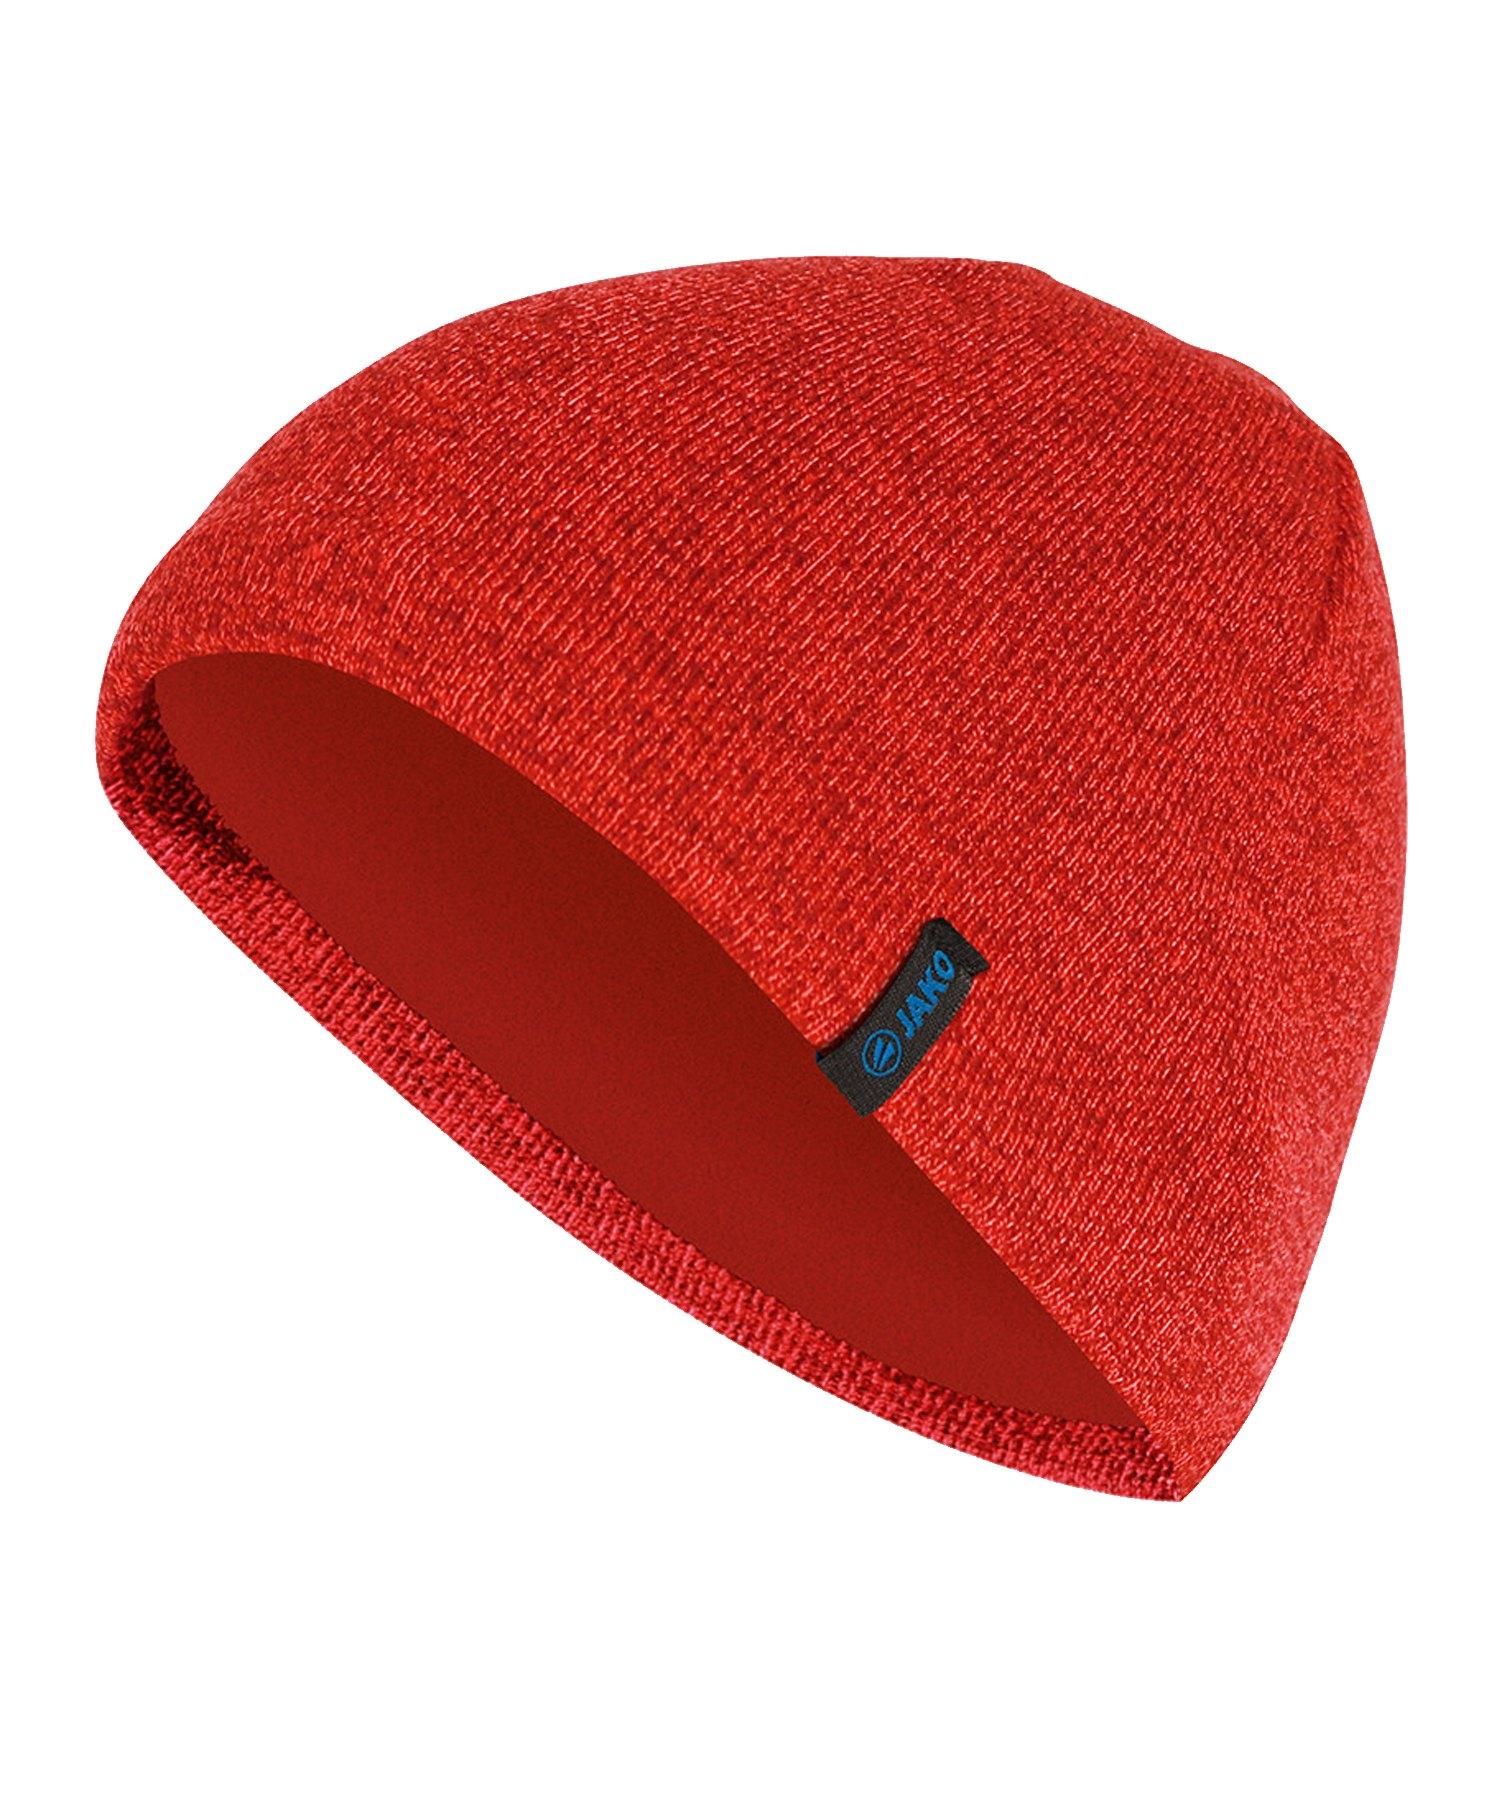 Jako Strickmütze Rot F01 - rot